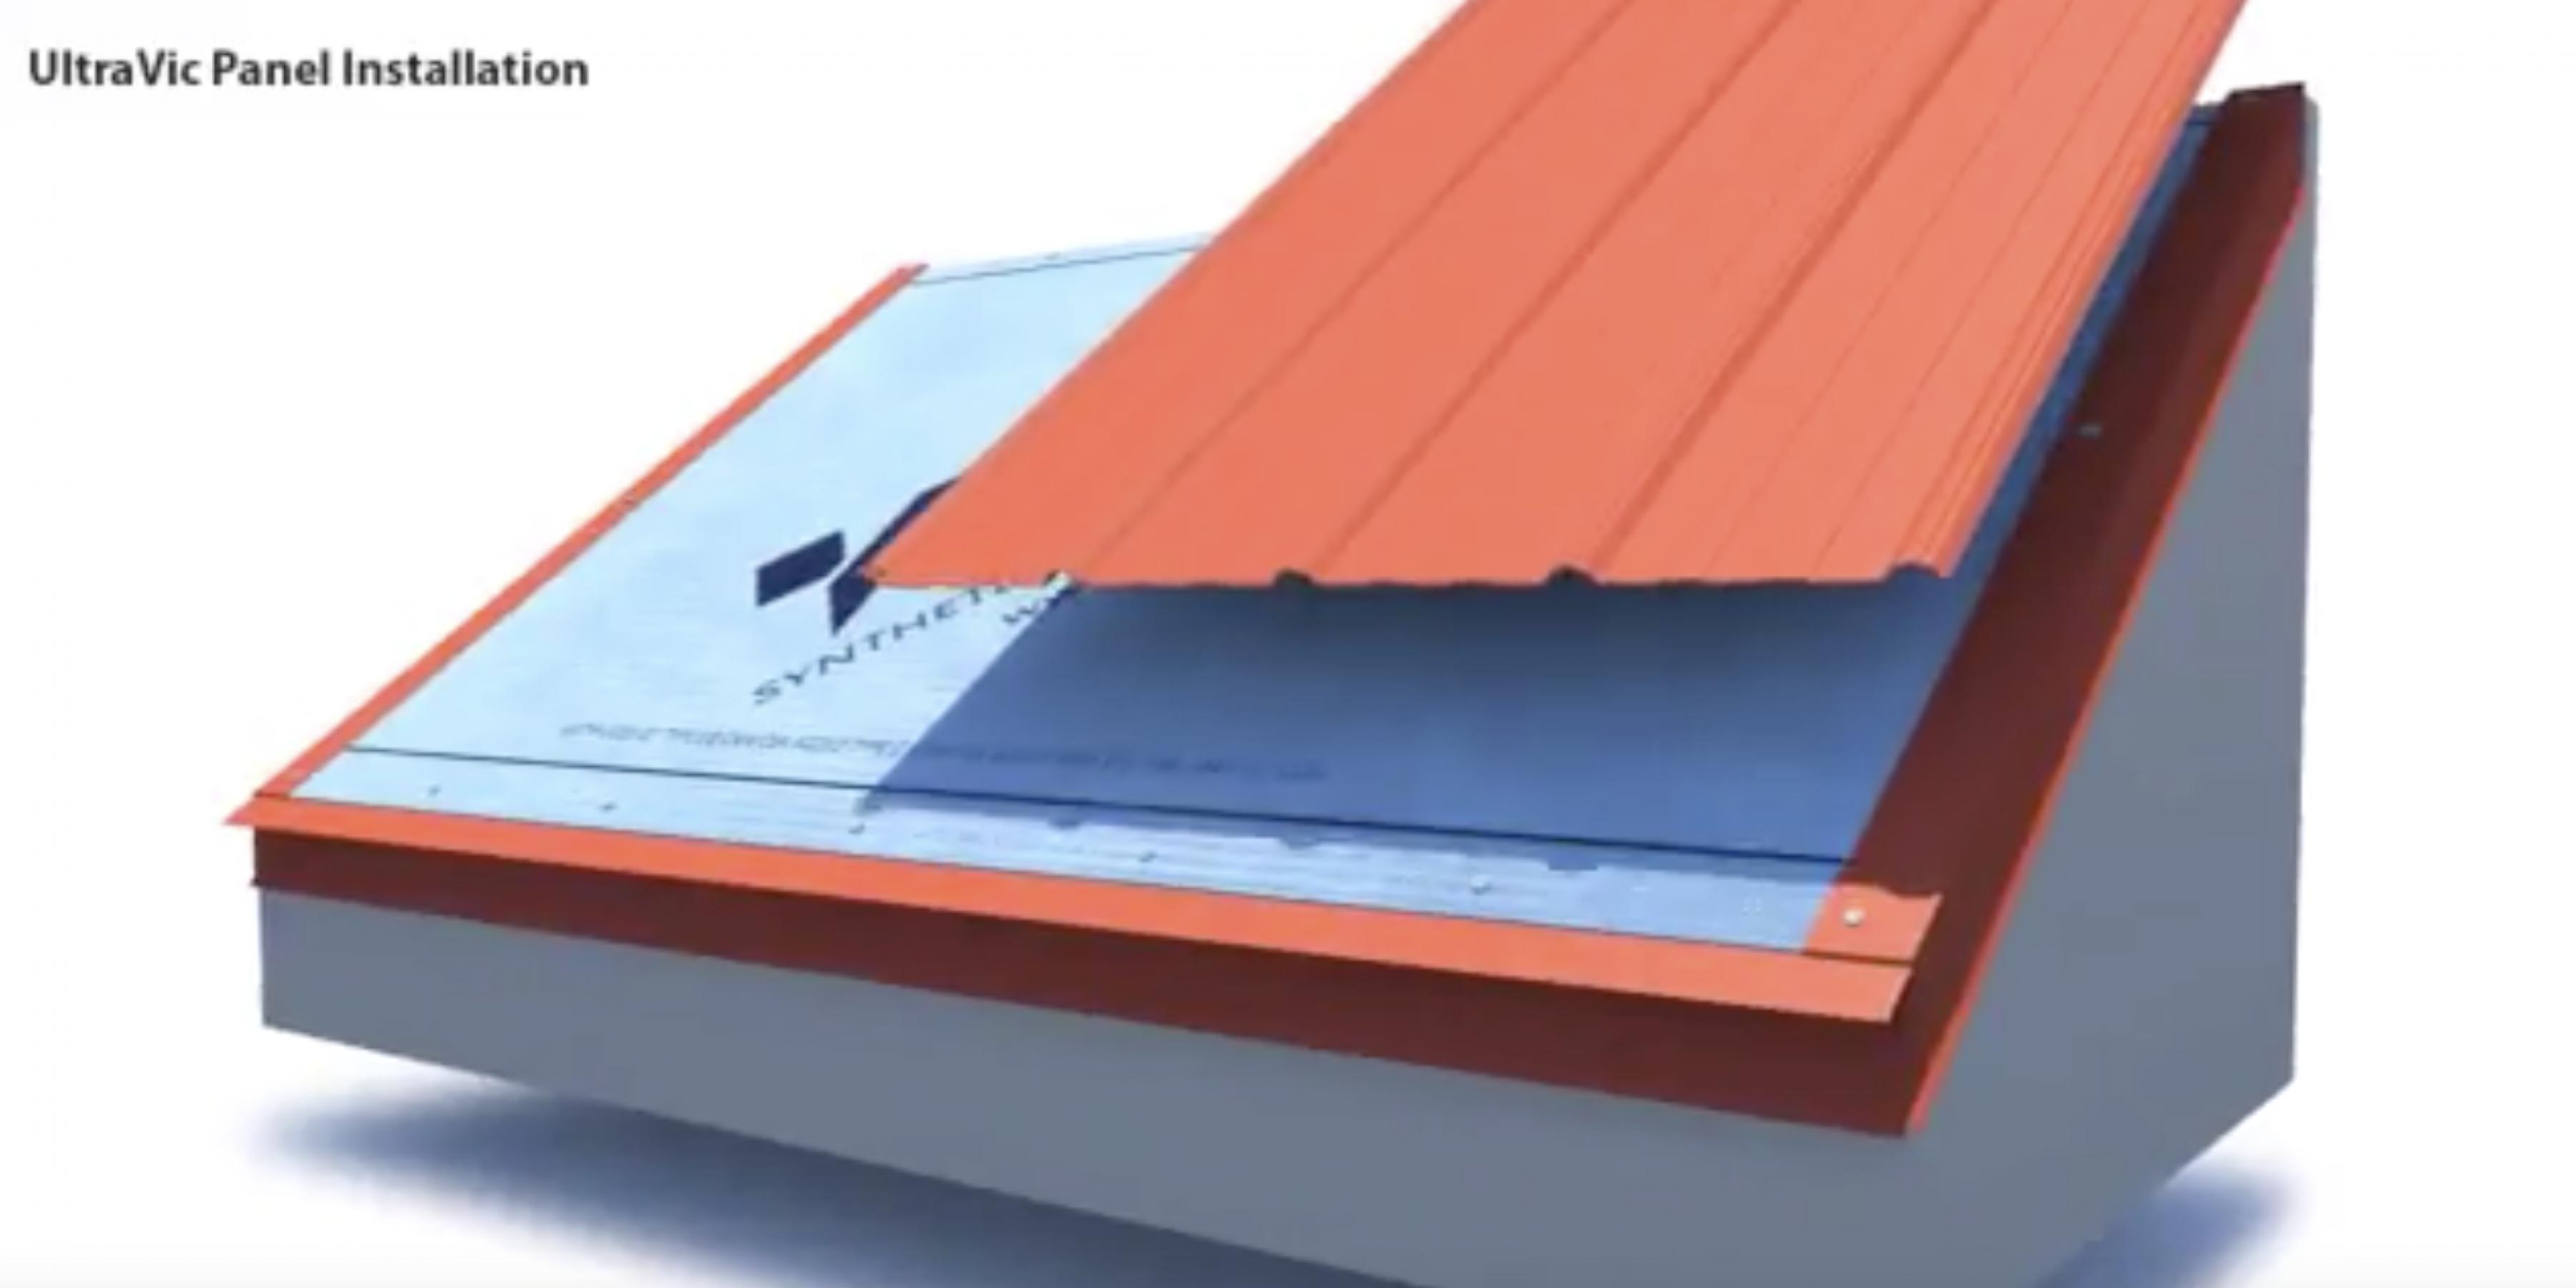 Panels Installation Video